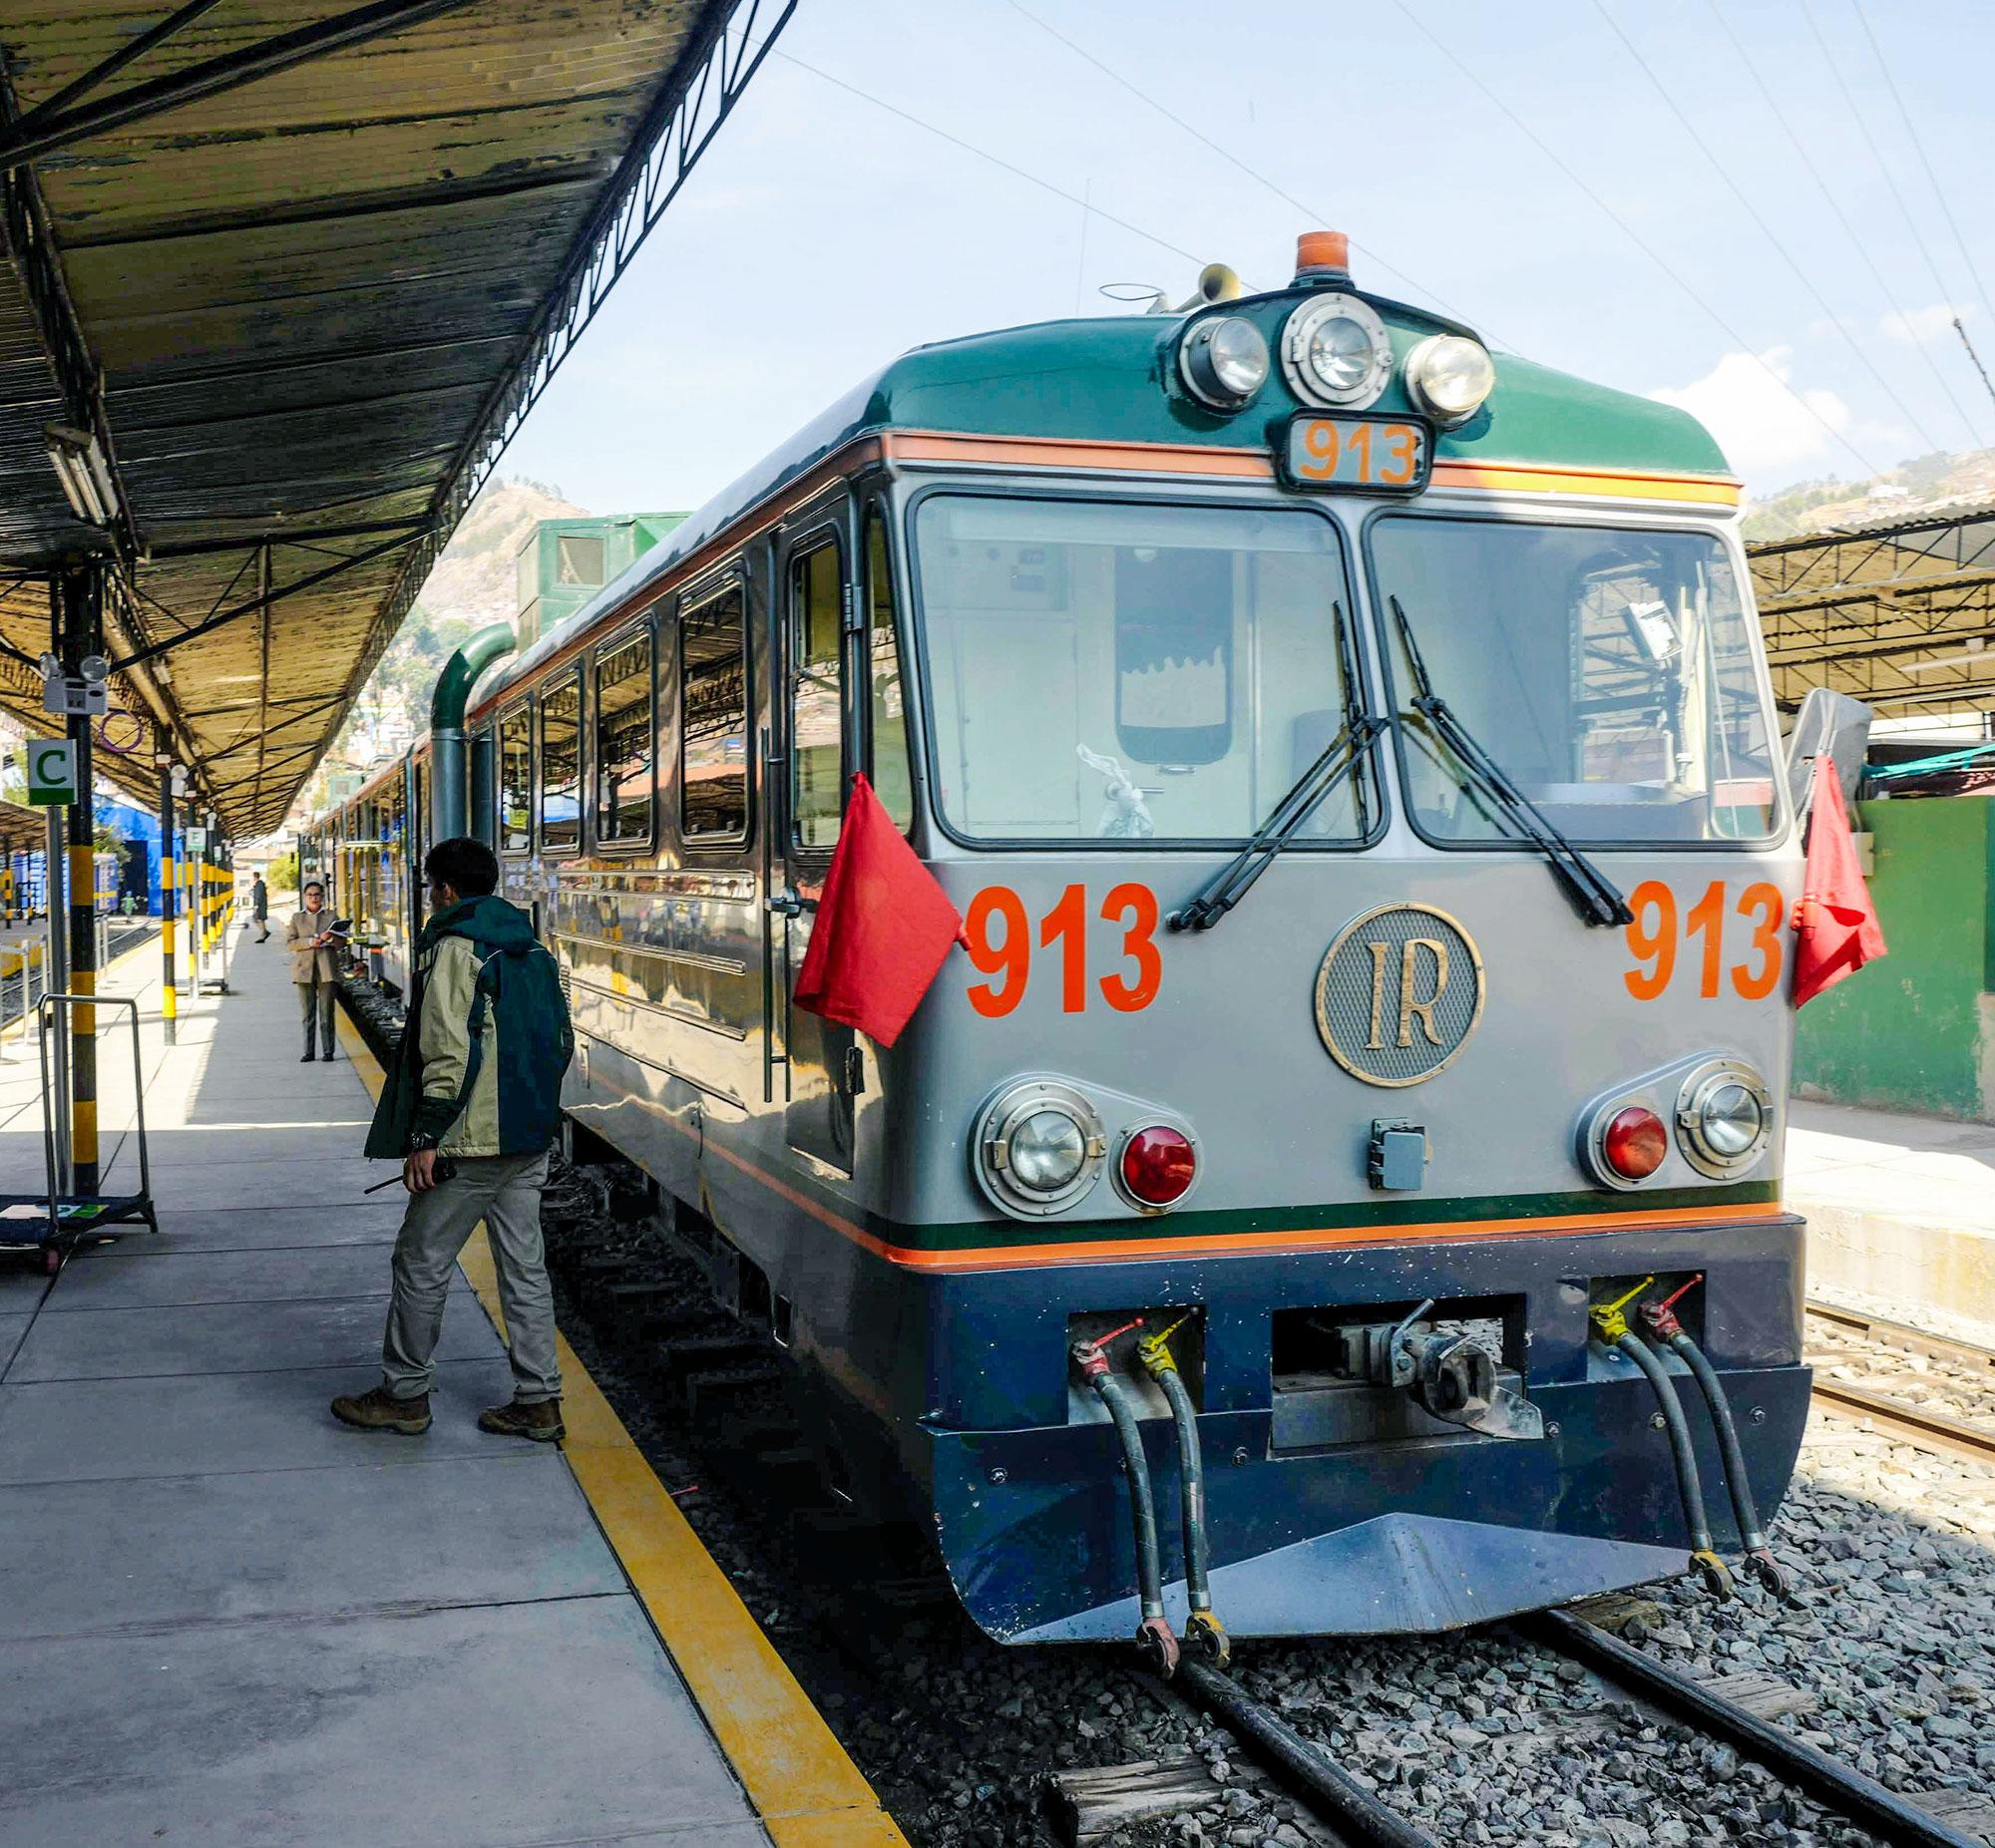 Incarail Train at the San Pedro Railway Station